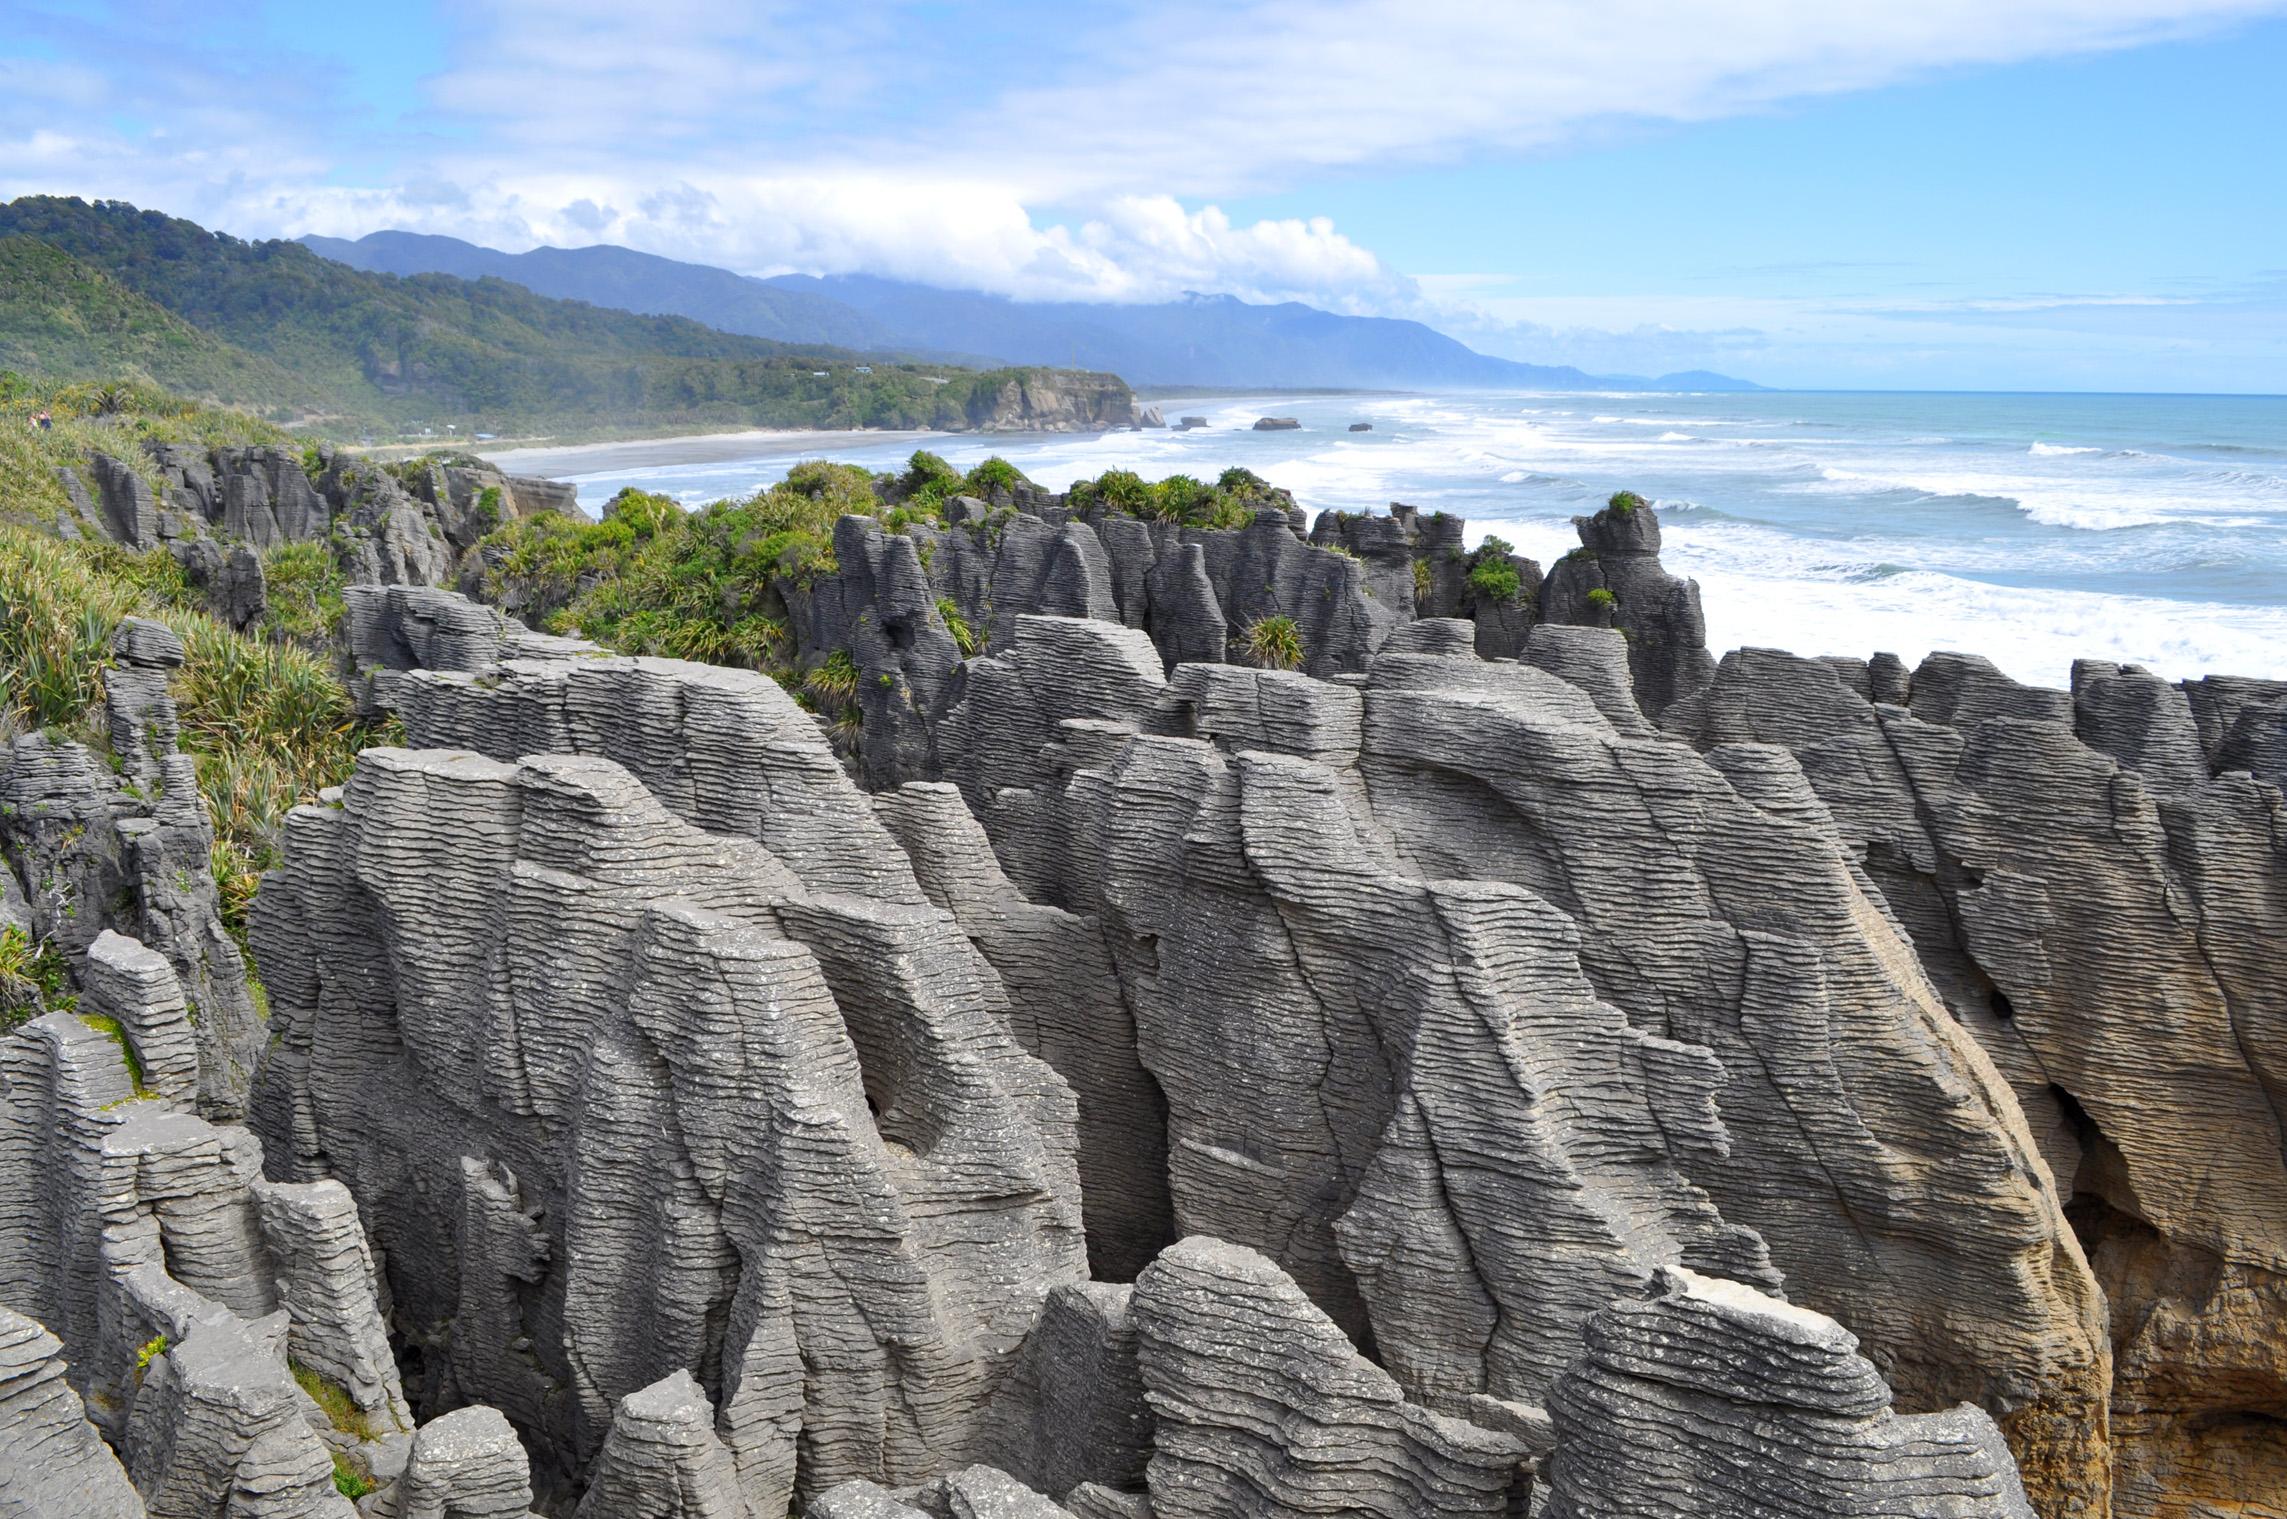 pancake-rocks-pregunto-de-new-zeland-secret-world